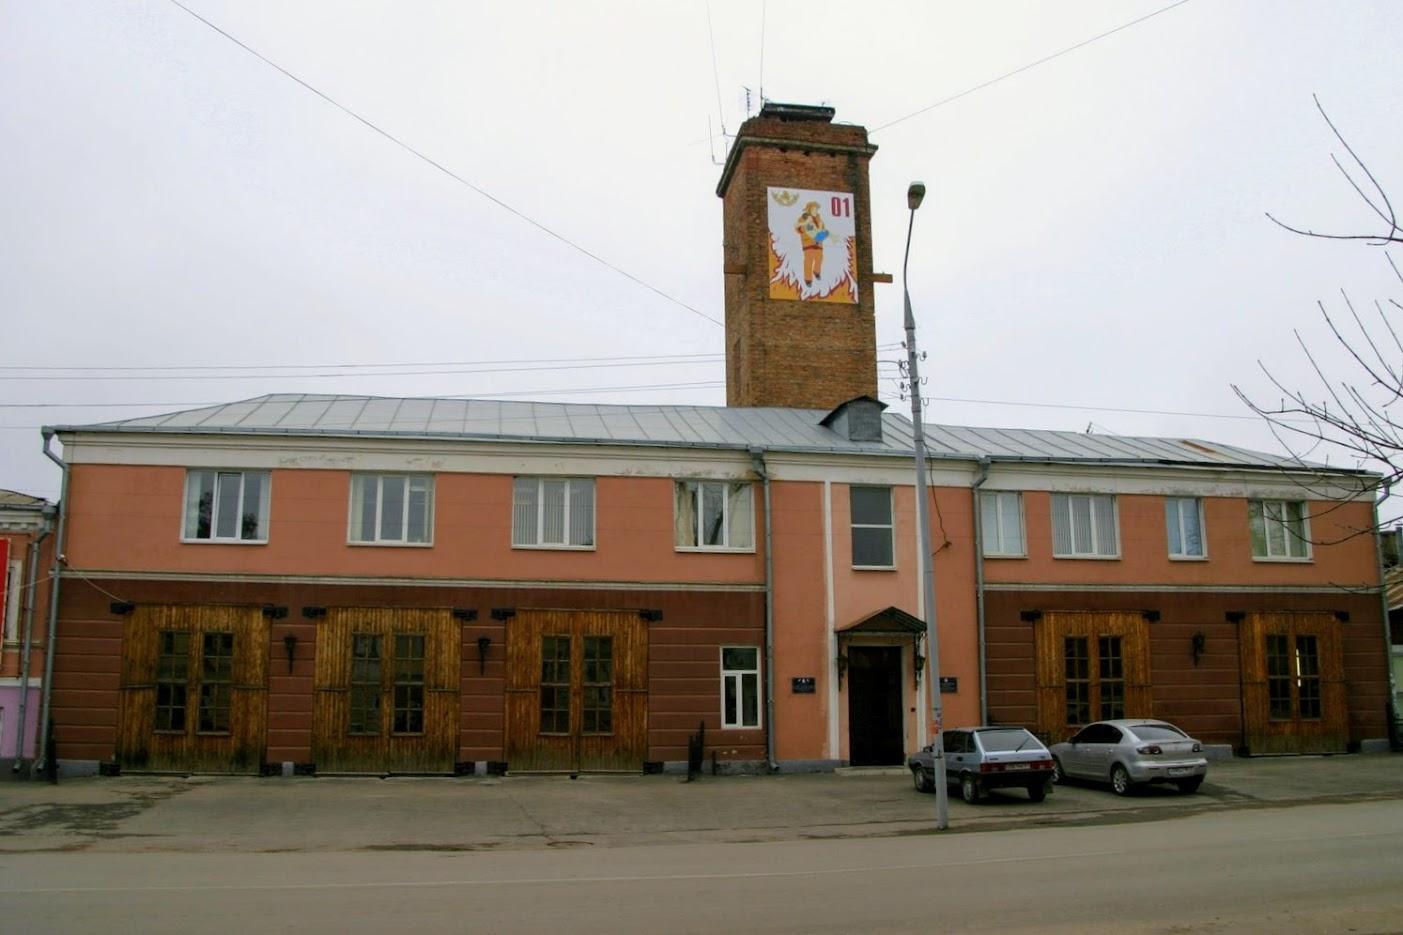 https://sites.google.com/site/istoriceskijtaganrog/cehova-ulica/dom-94